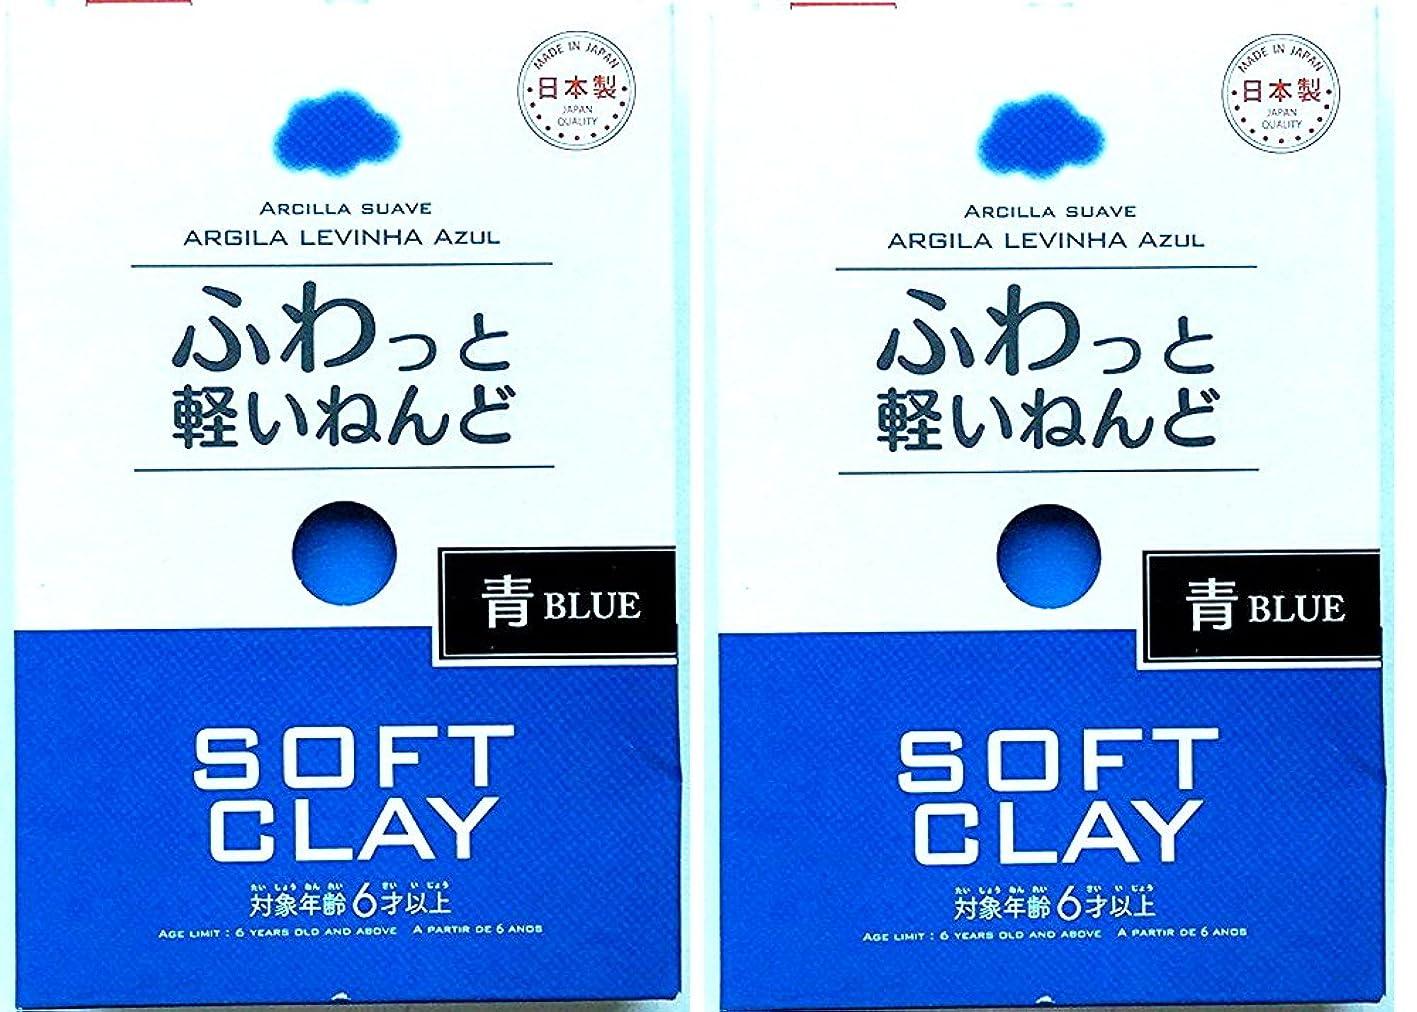 2 X Soft Clay (blue) zmuvmxbsish239